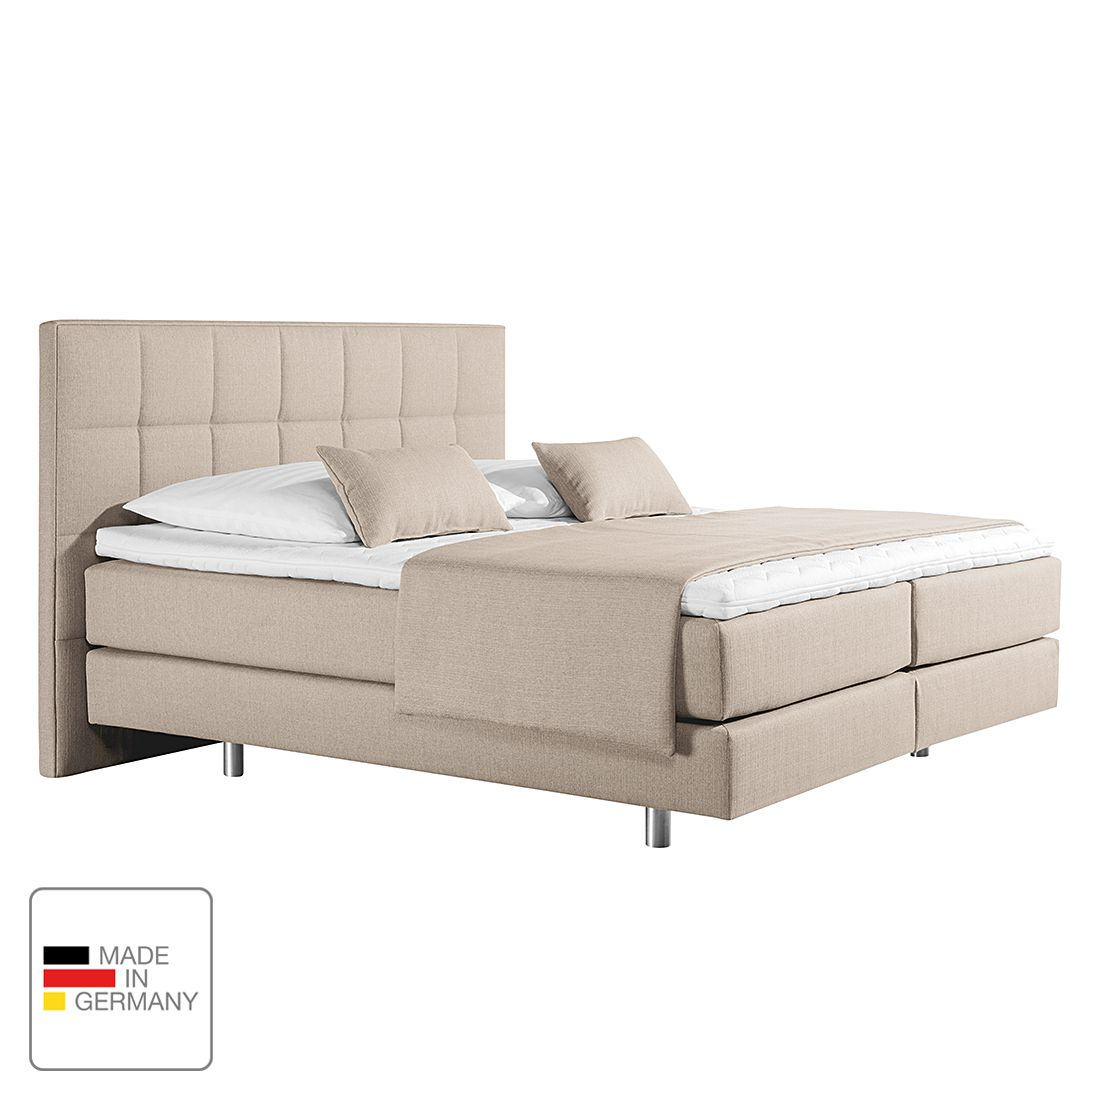 monaco boxspringbett tevin webstoff 160 x 200cm h3 ab 80 kg. Black Bedroom Furniture Sets. Home Design Ideas